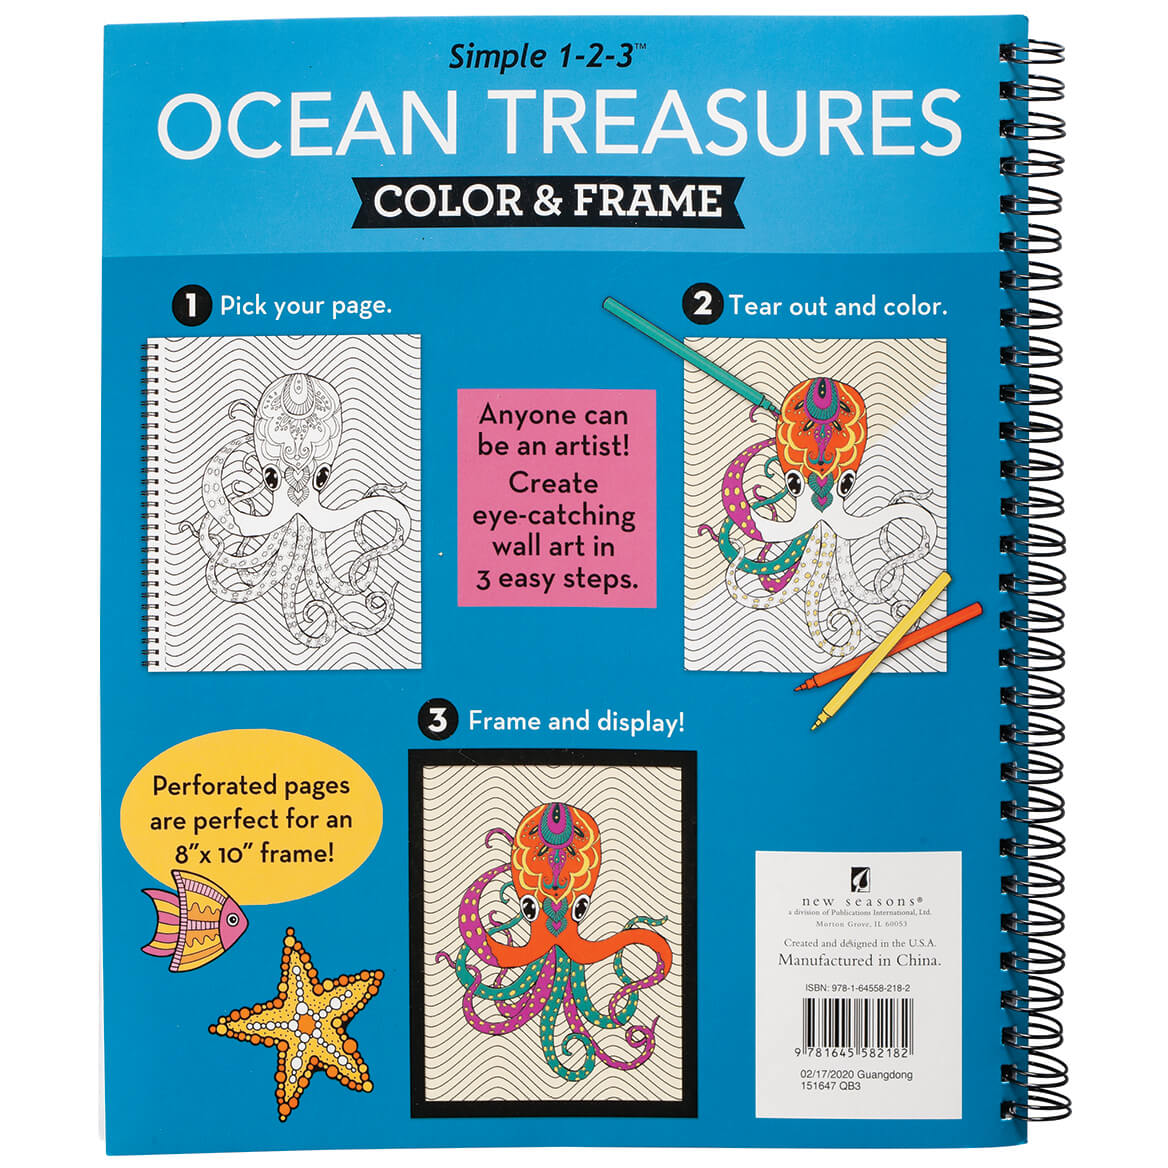 Simple 1-2-3™ Ocean Treasures Color & Frame Book-371705